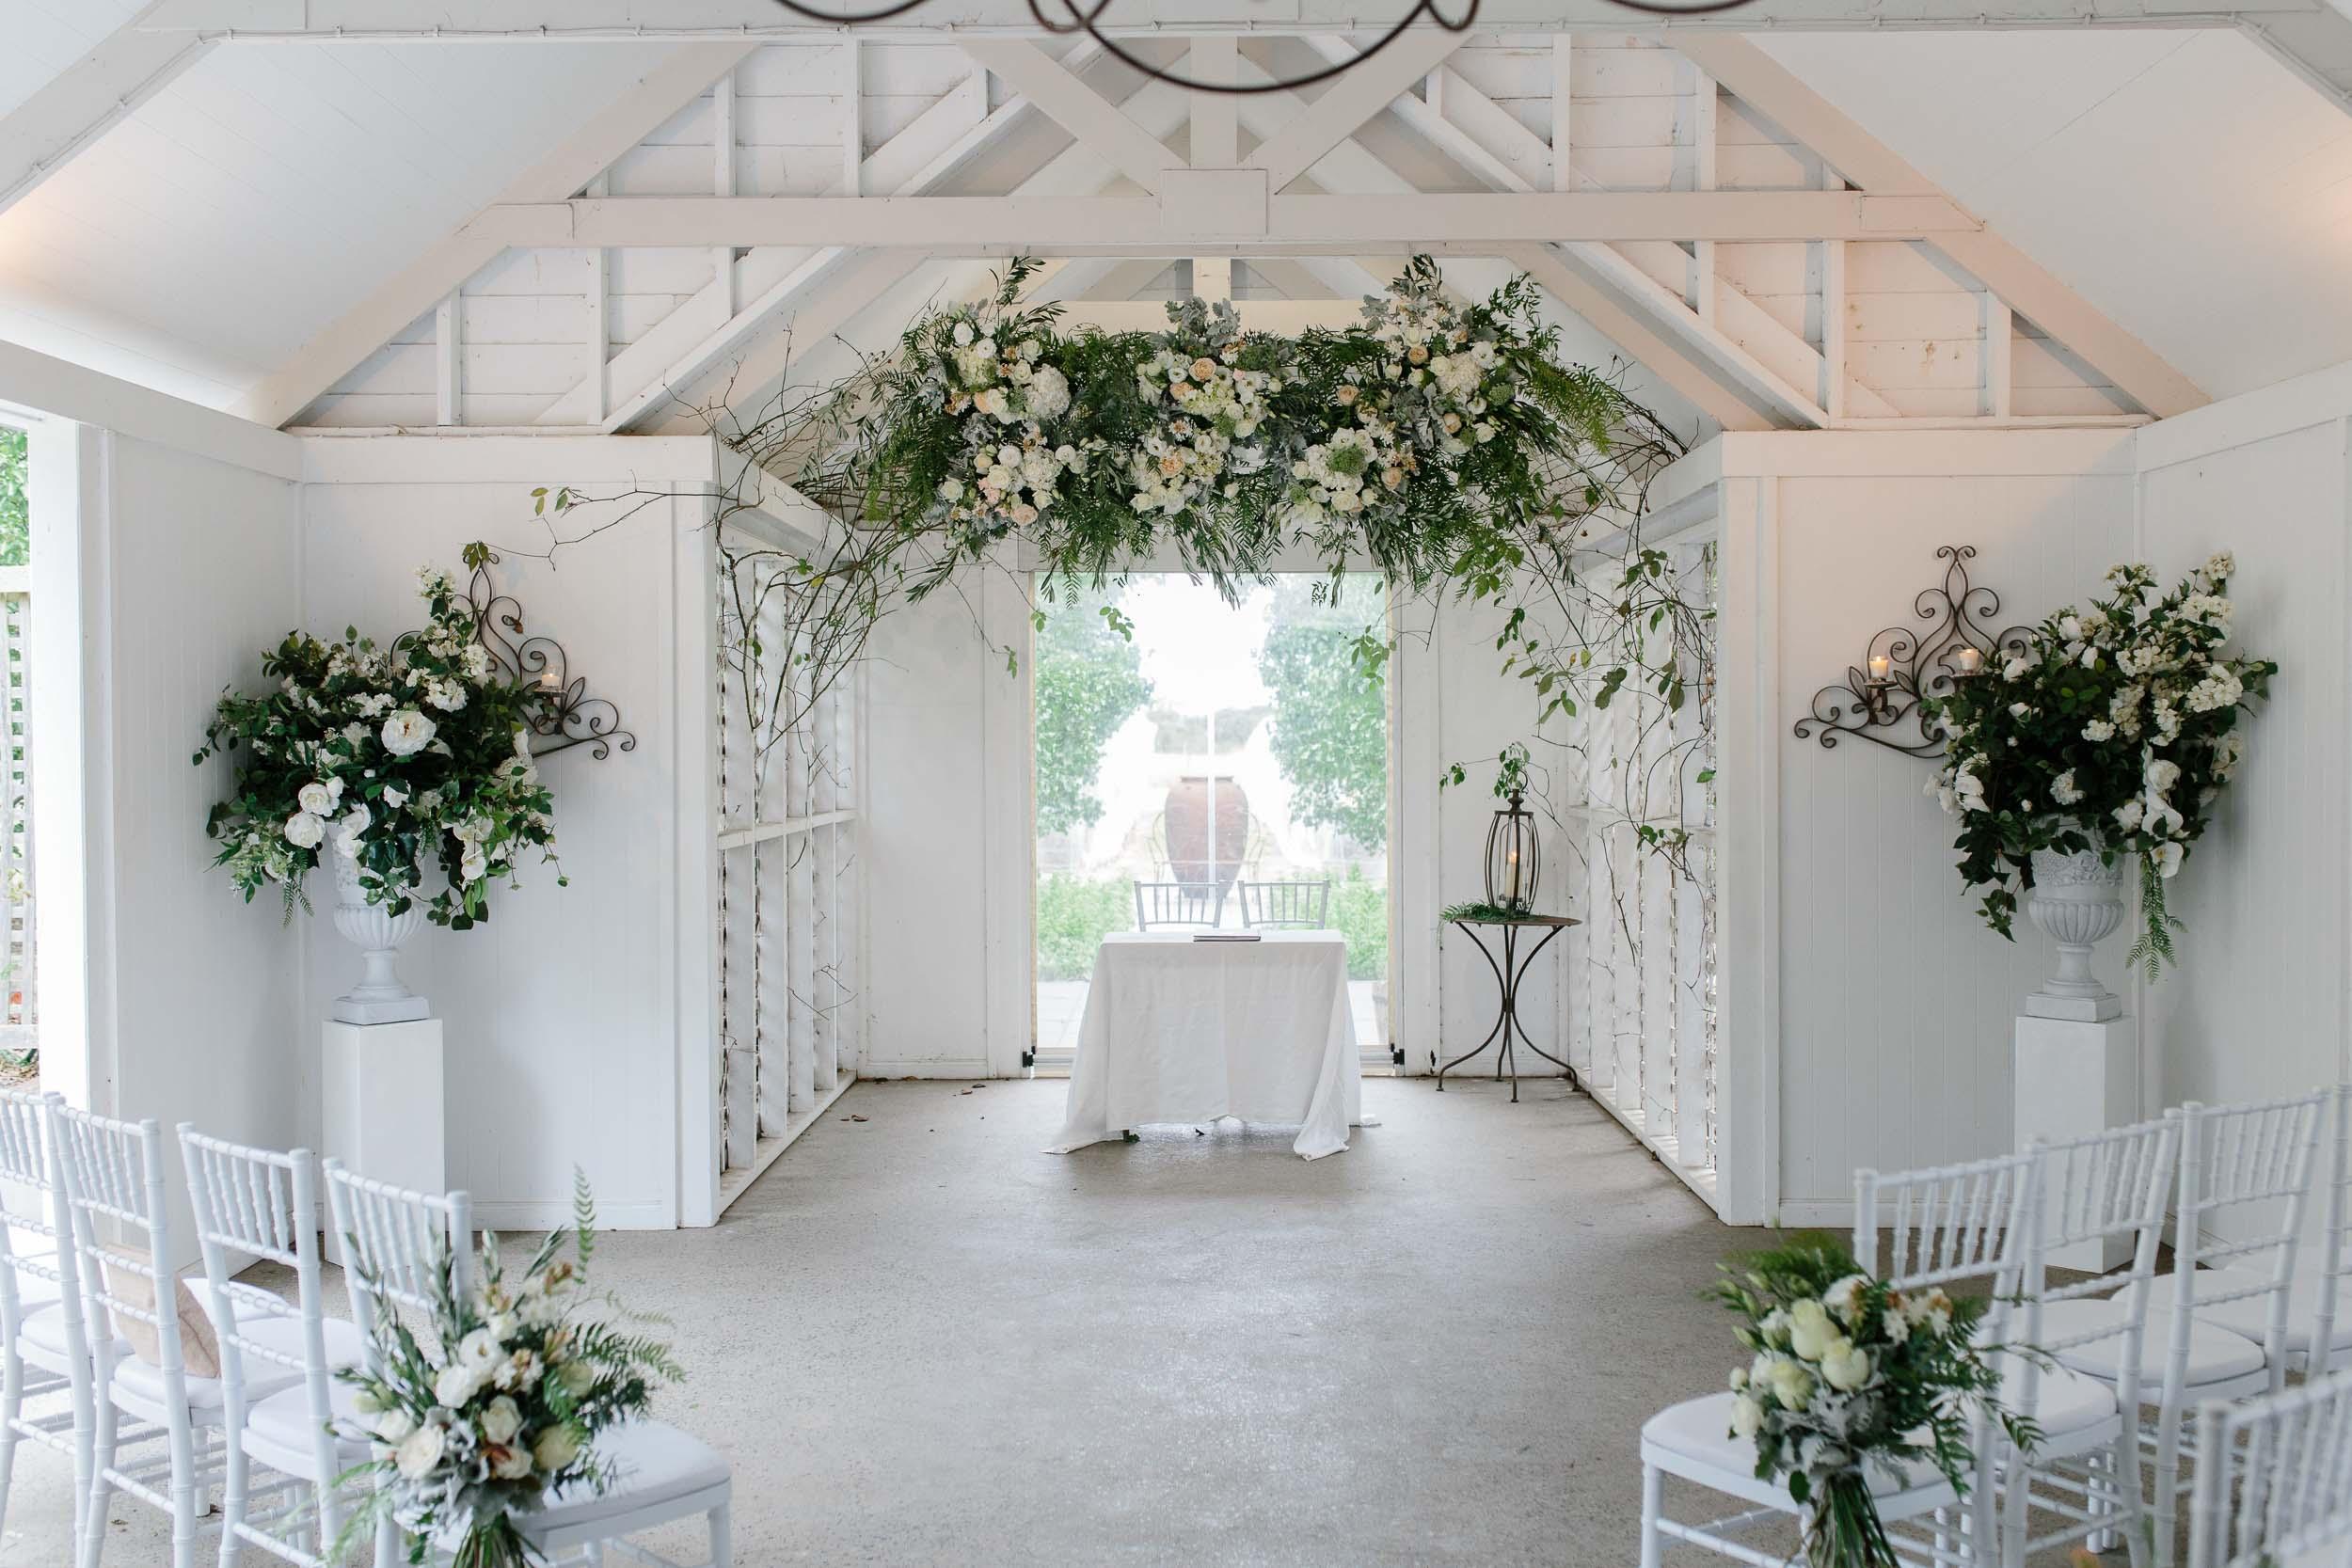 Kas-Richards-Mornington-Peninsula-Private-Property-Wedding-Marianna-Hardwick-Gown-147.jpg